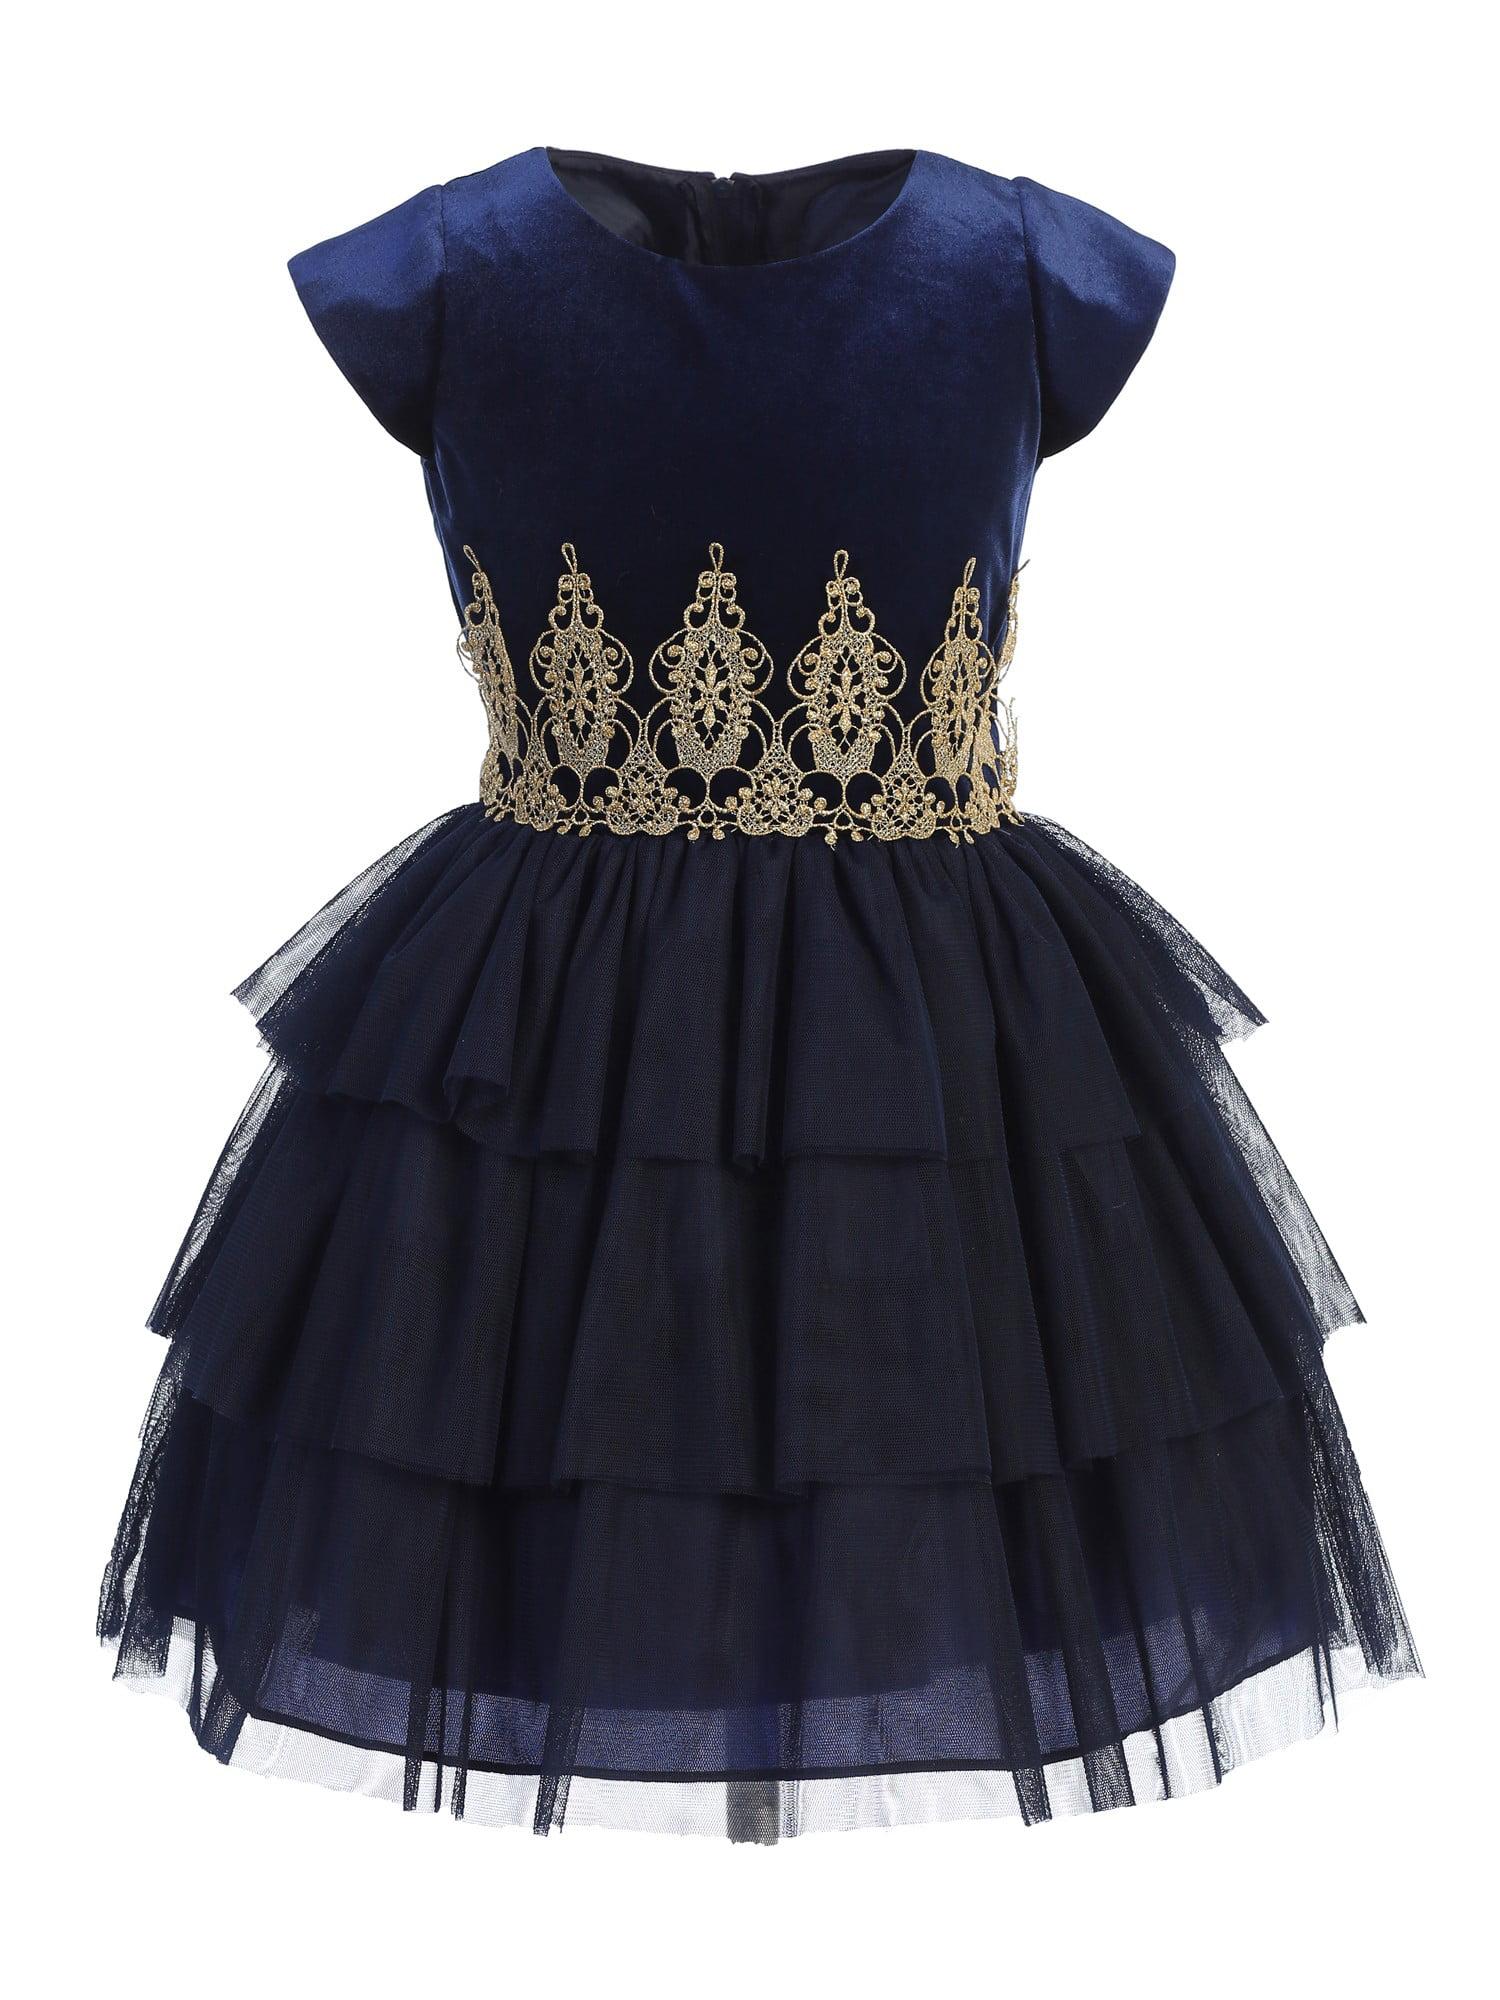 Sweet Kids Little Girls Navy Blue Lace Tiered Short Sleeve